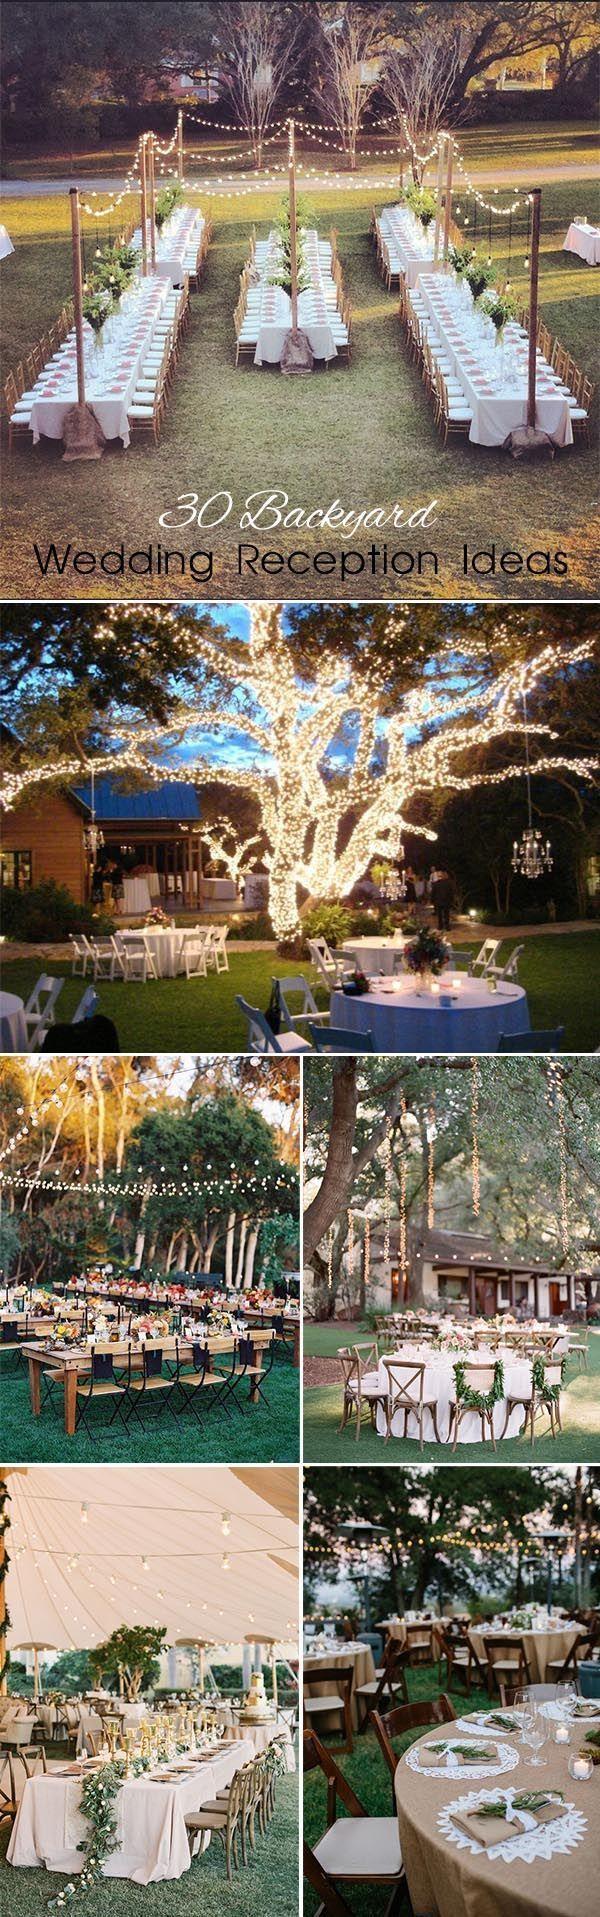 best OutdoorGarden Wedding Inspiration images on Pinterest